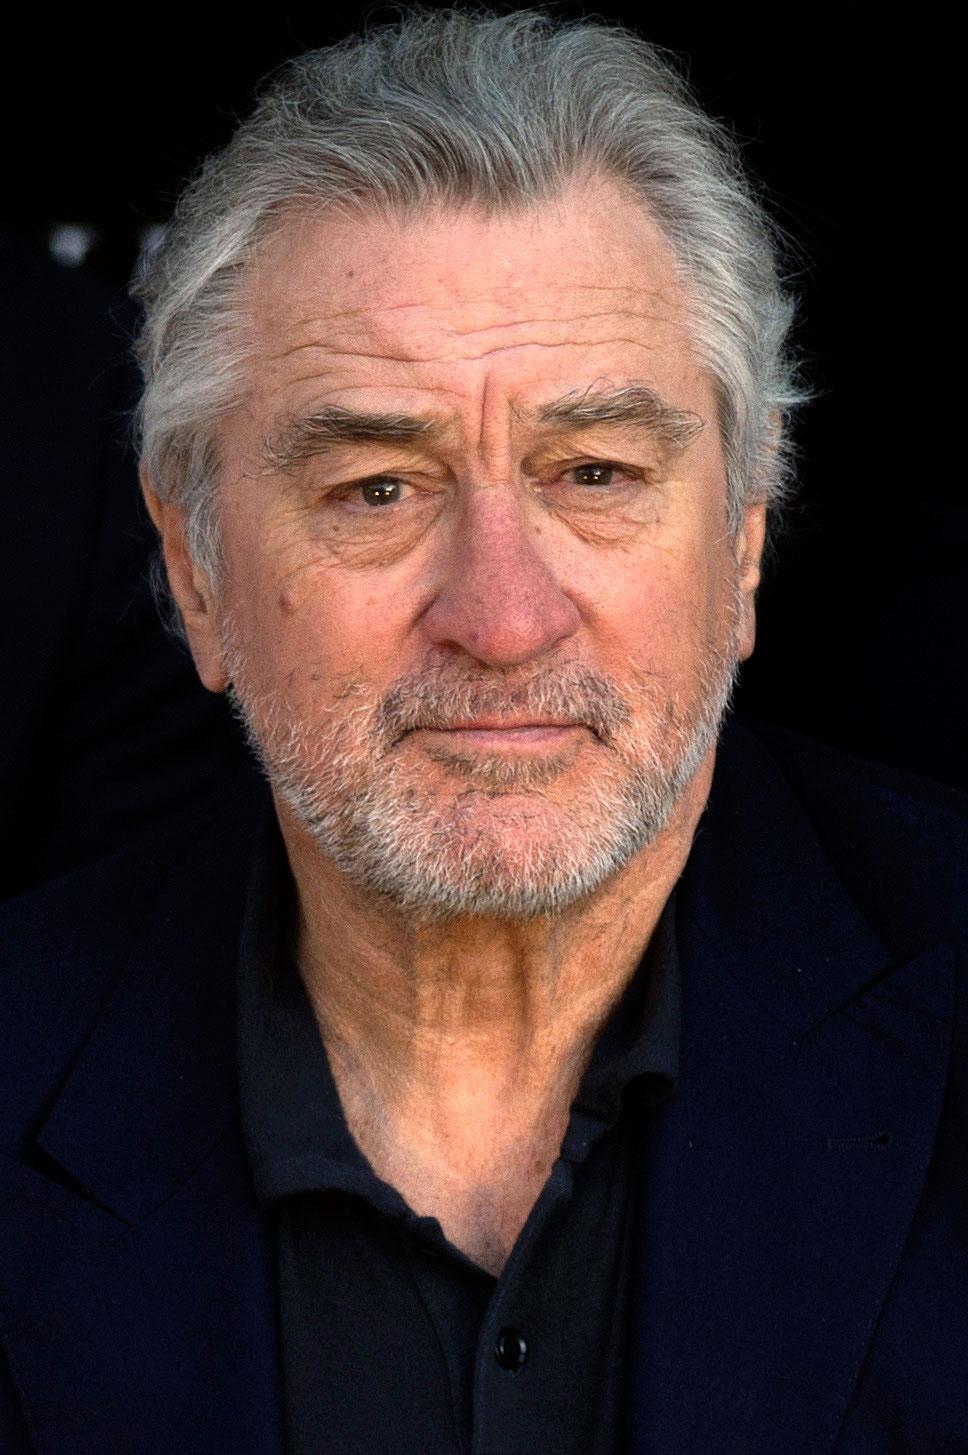 Robert De Niro Breaks His Silence on 'Difficult' Split From Wife Grace Hightower